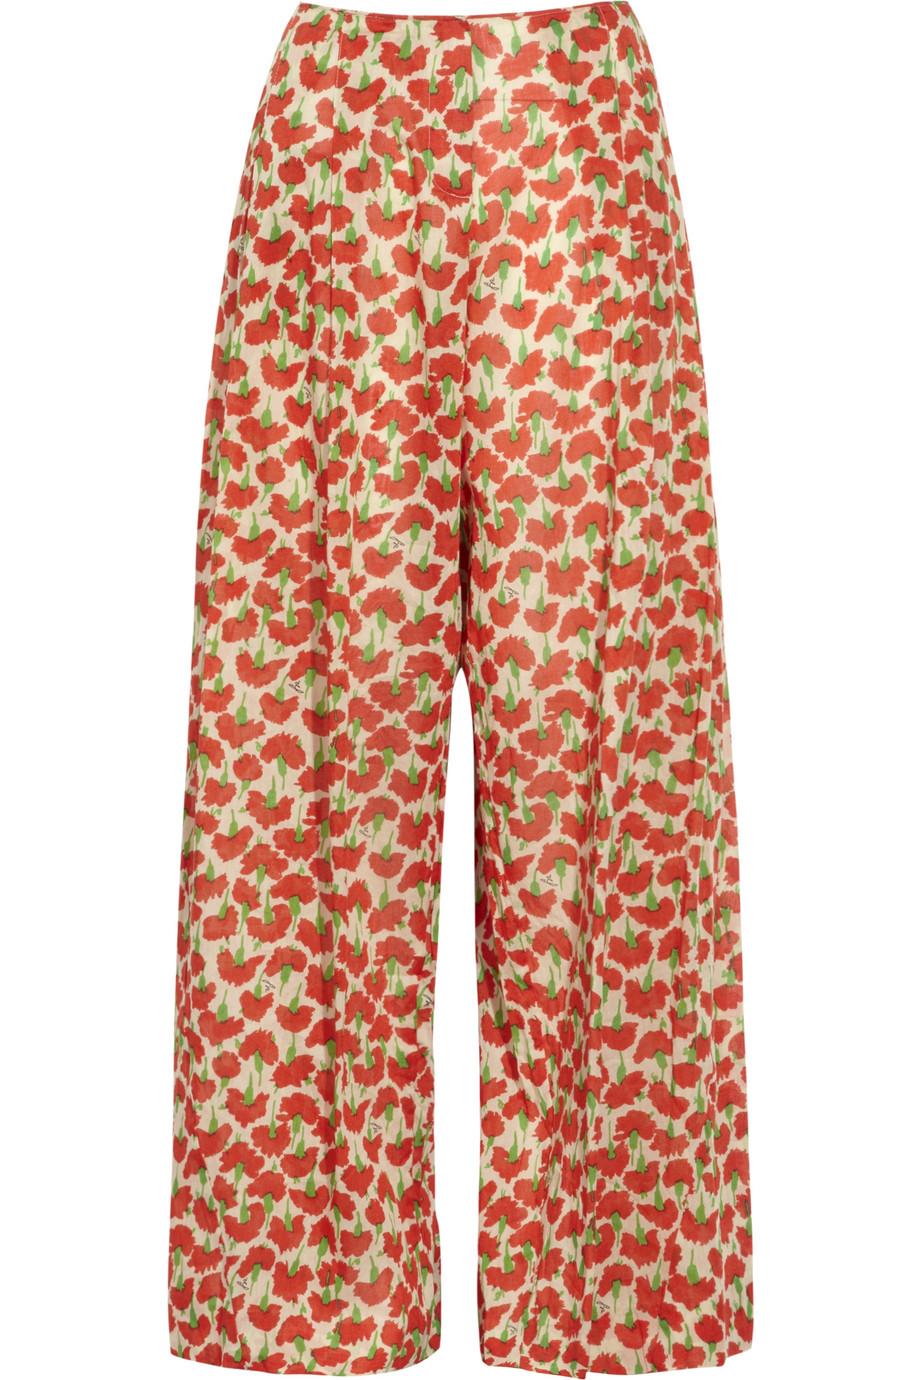 Discount Sonia Rykiel Wide-leg floral-print cotton pants|THE OUTNET